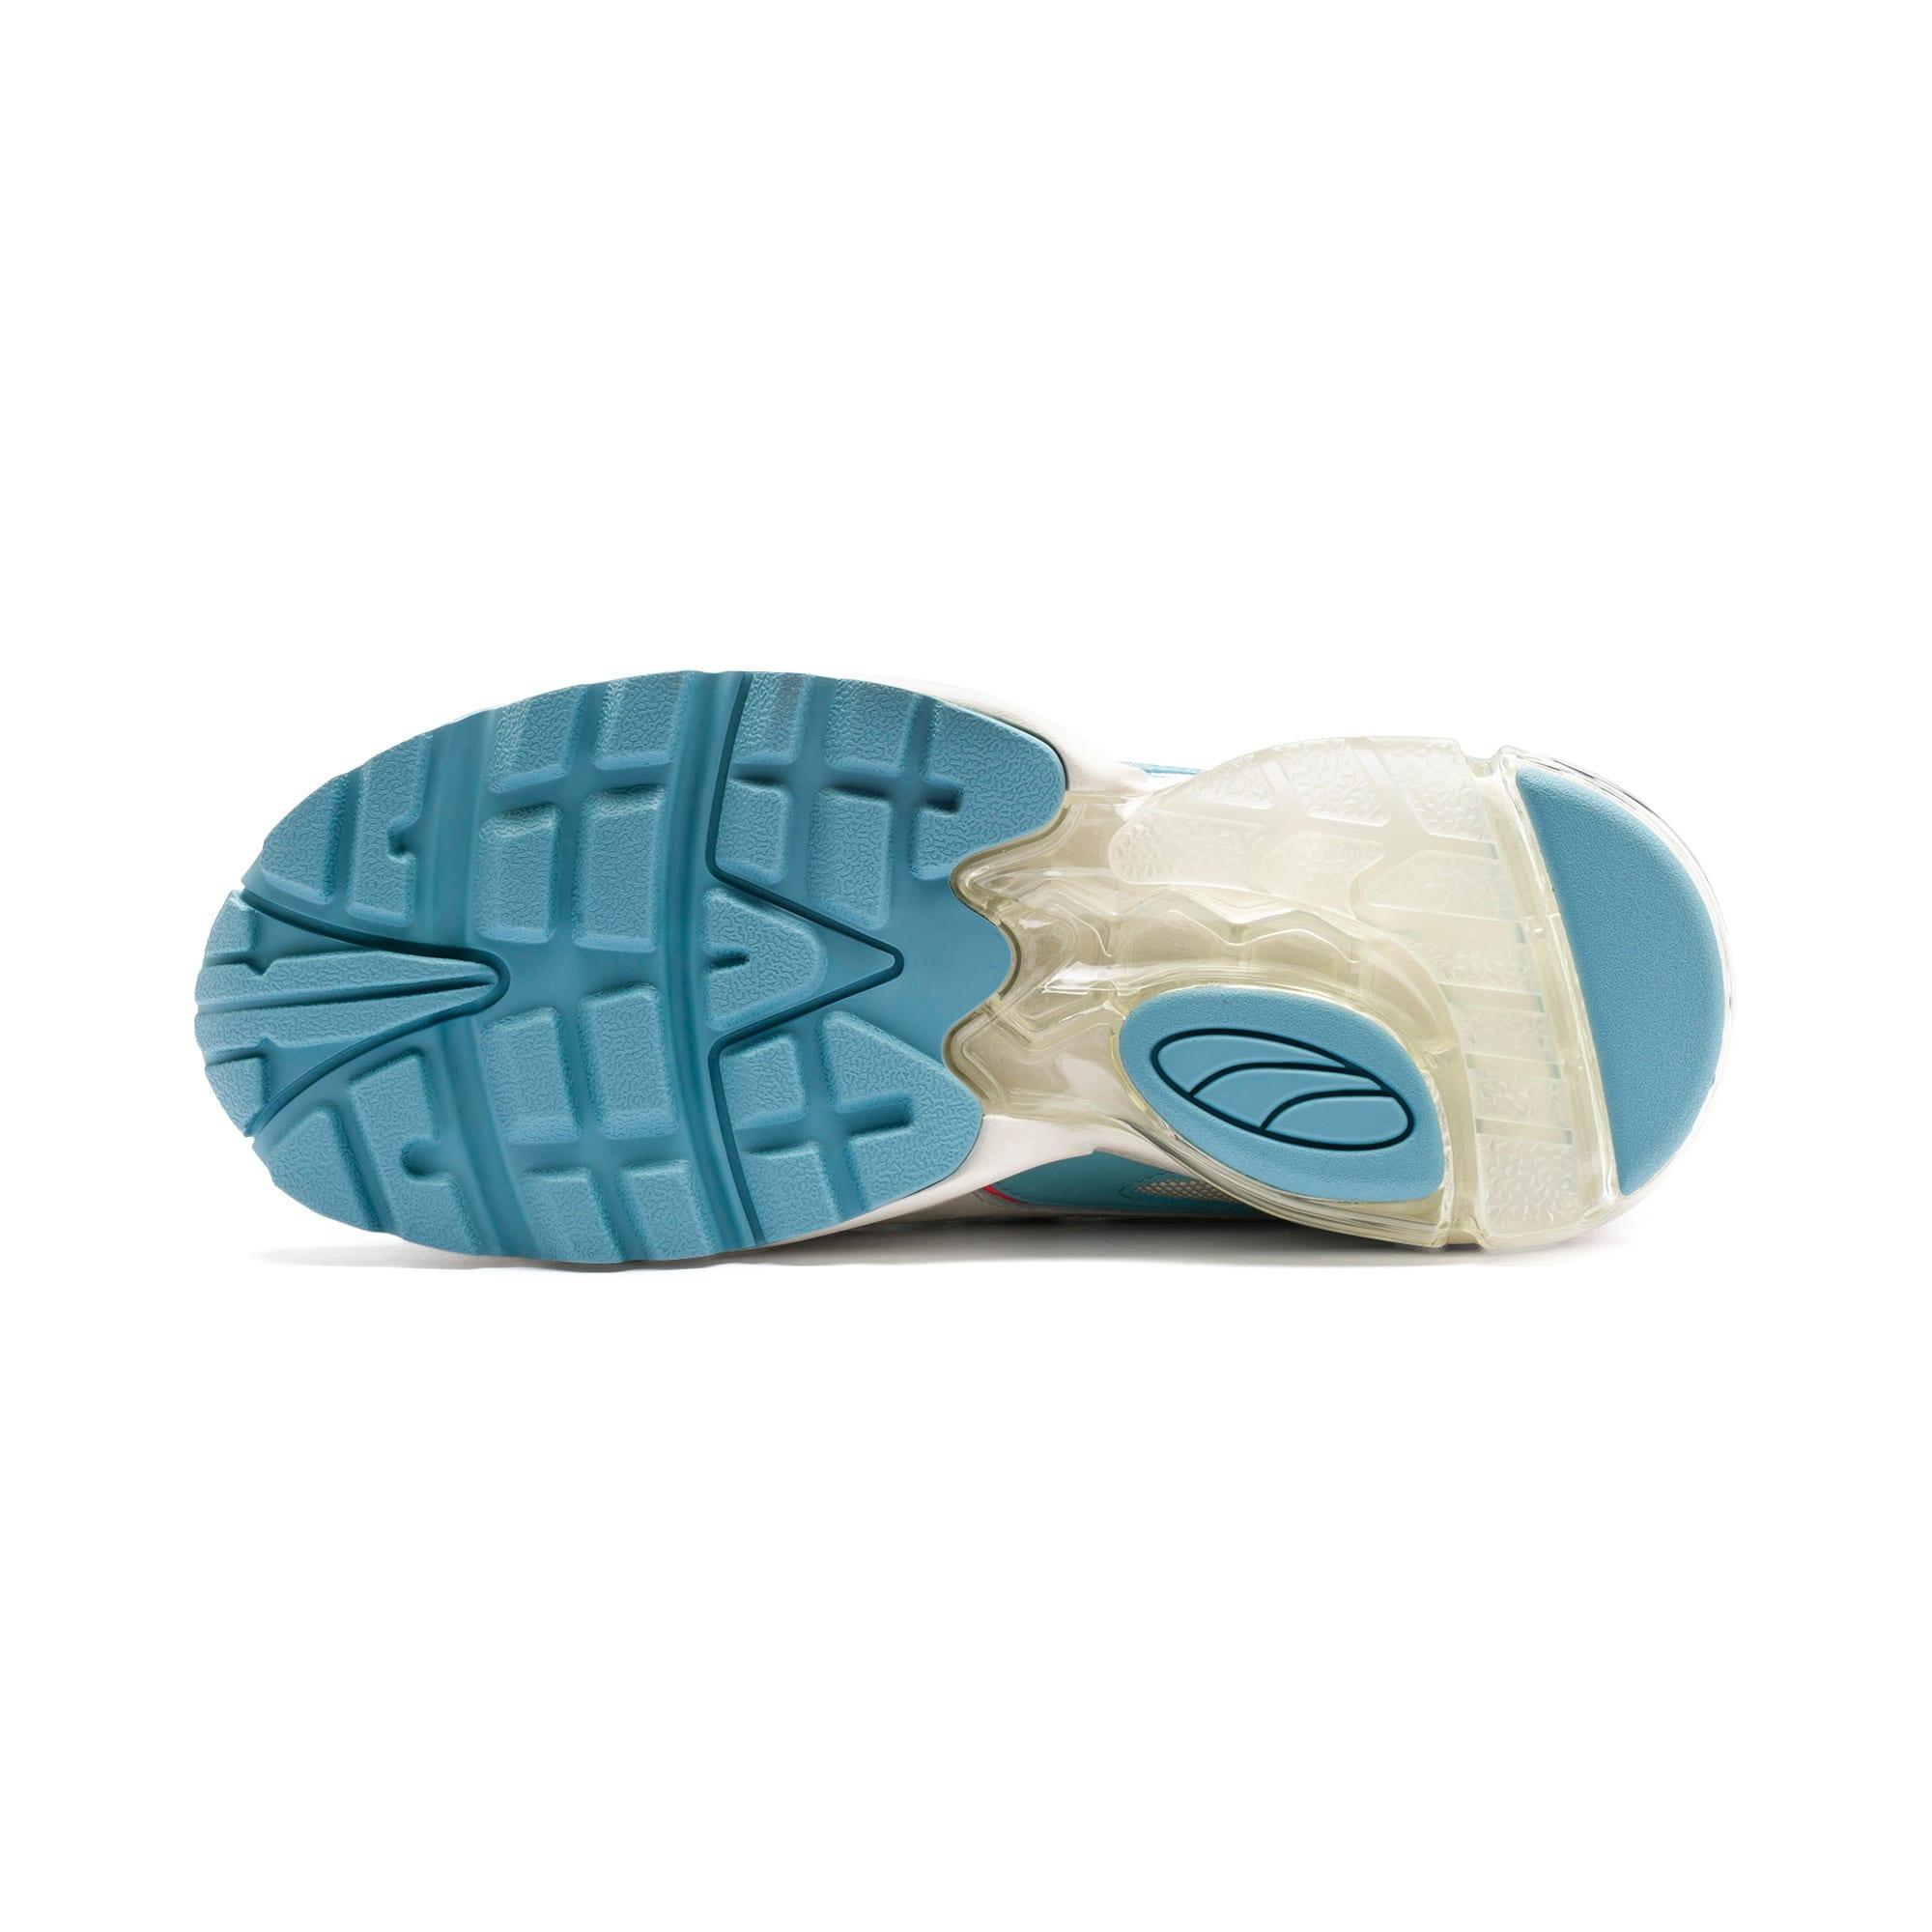 Thumbnail 5 of CELL Stellar Damen Sneaker, Milky Blue-Puma Team Gold, medium